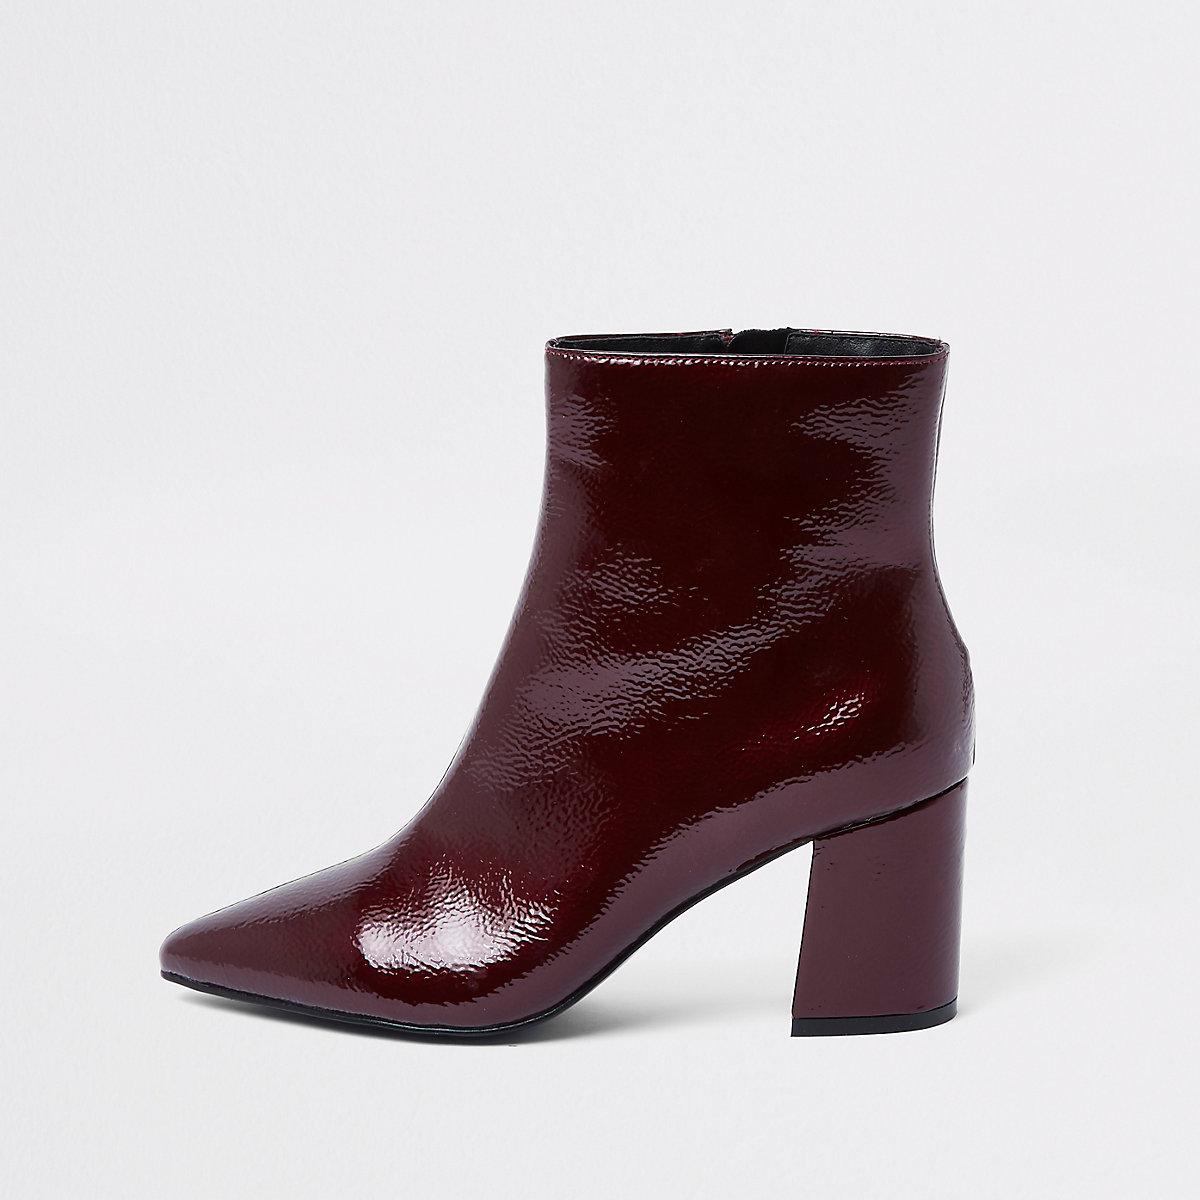 Donkerrode laarzen met puntige neus en blokhak